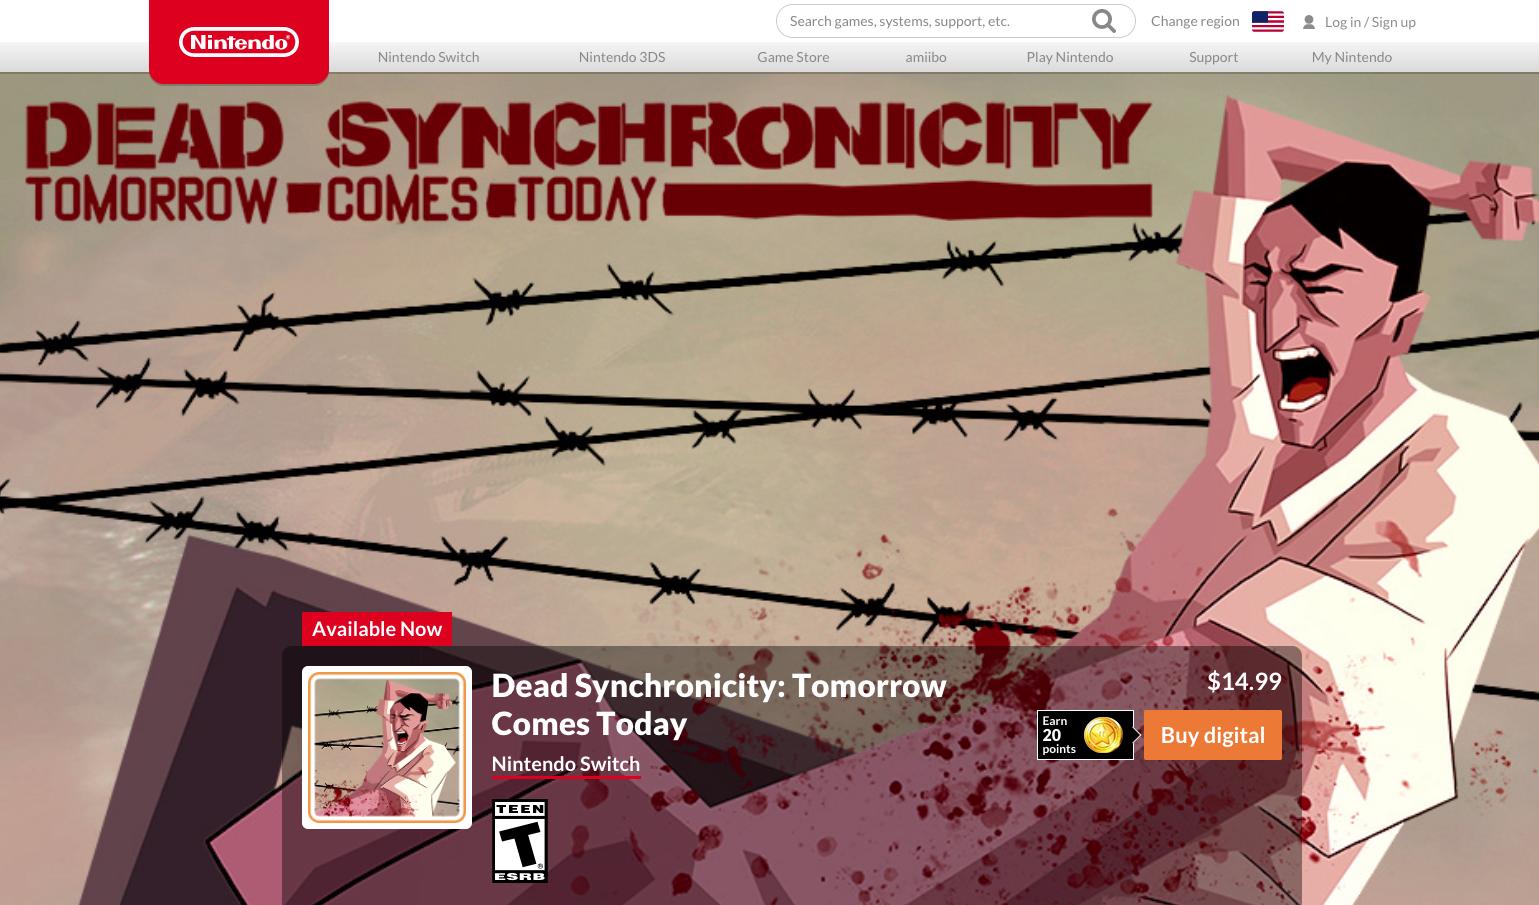 Dead Synchronicity - Nintendo Switch